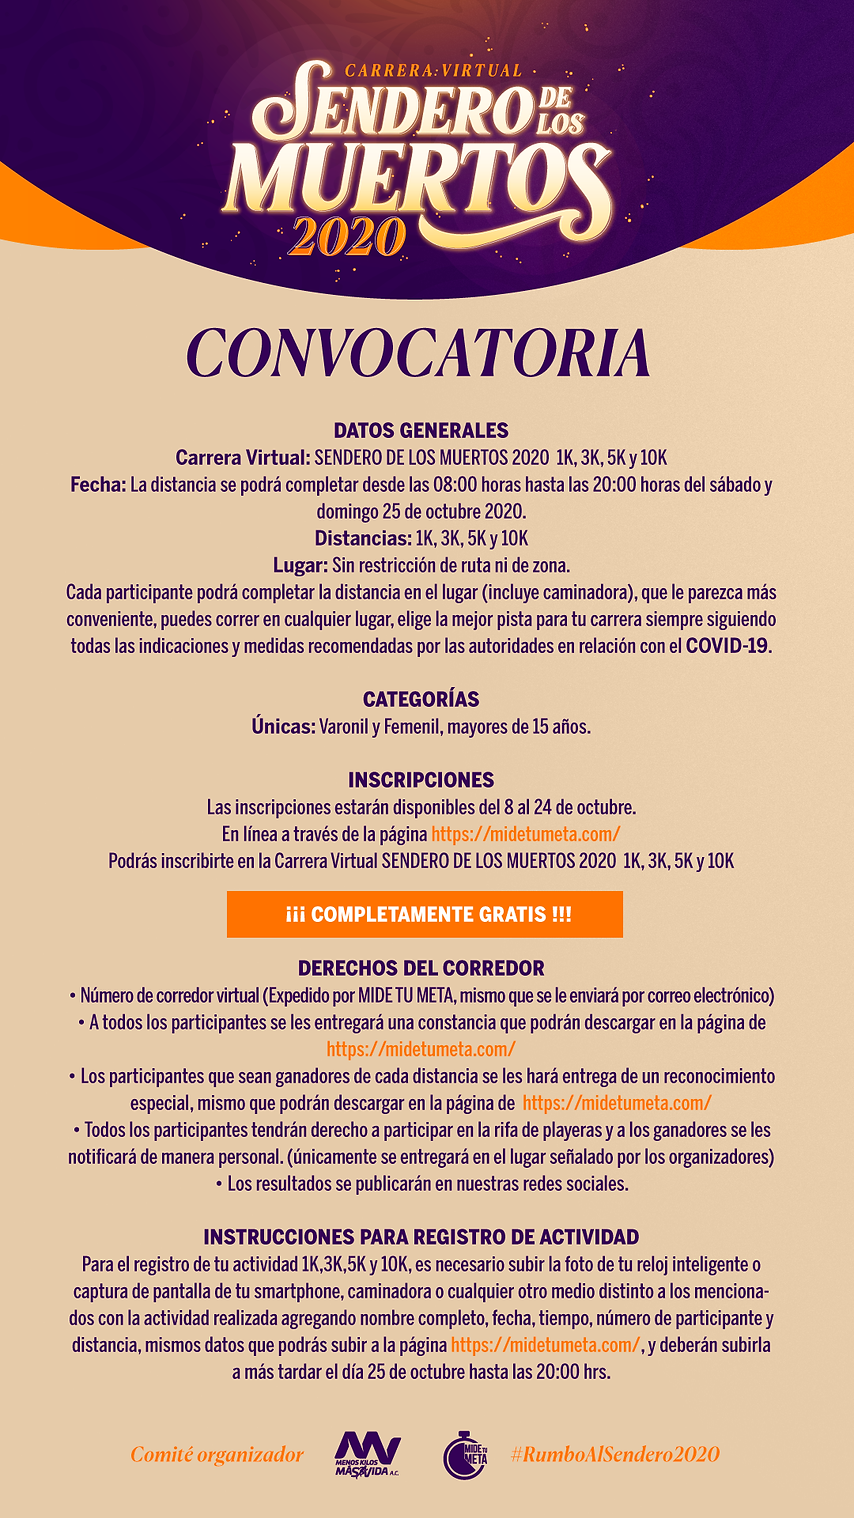 Convocatoria_Sendero_Muertos_2020.png